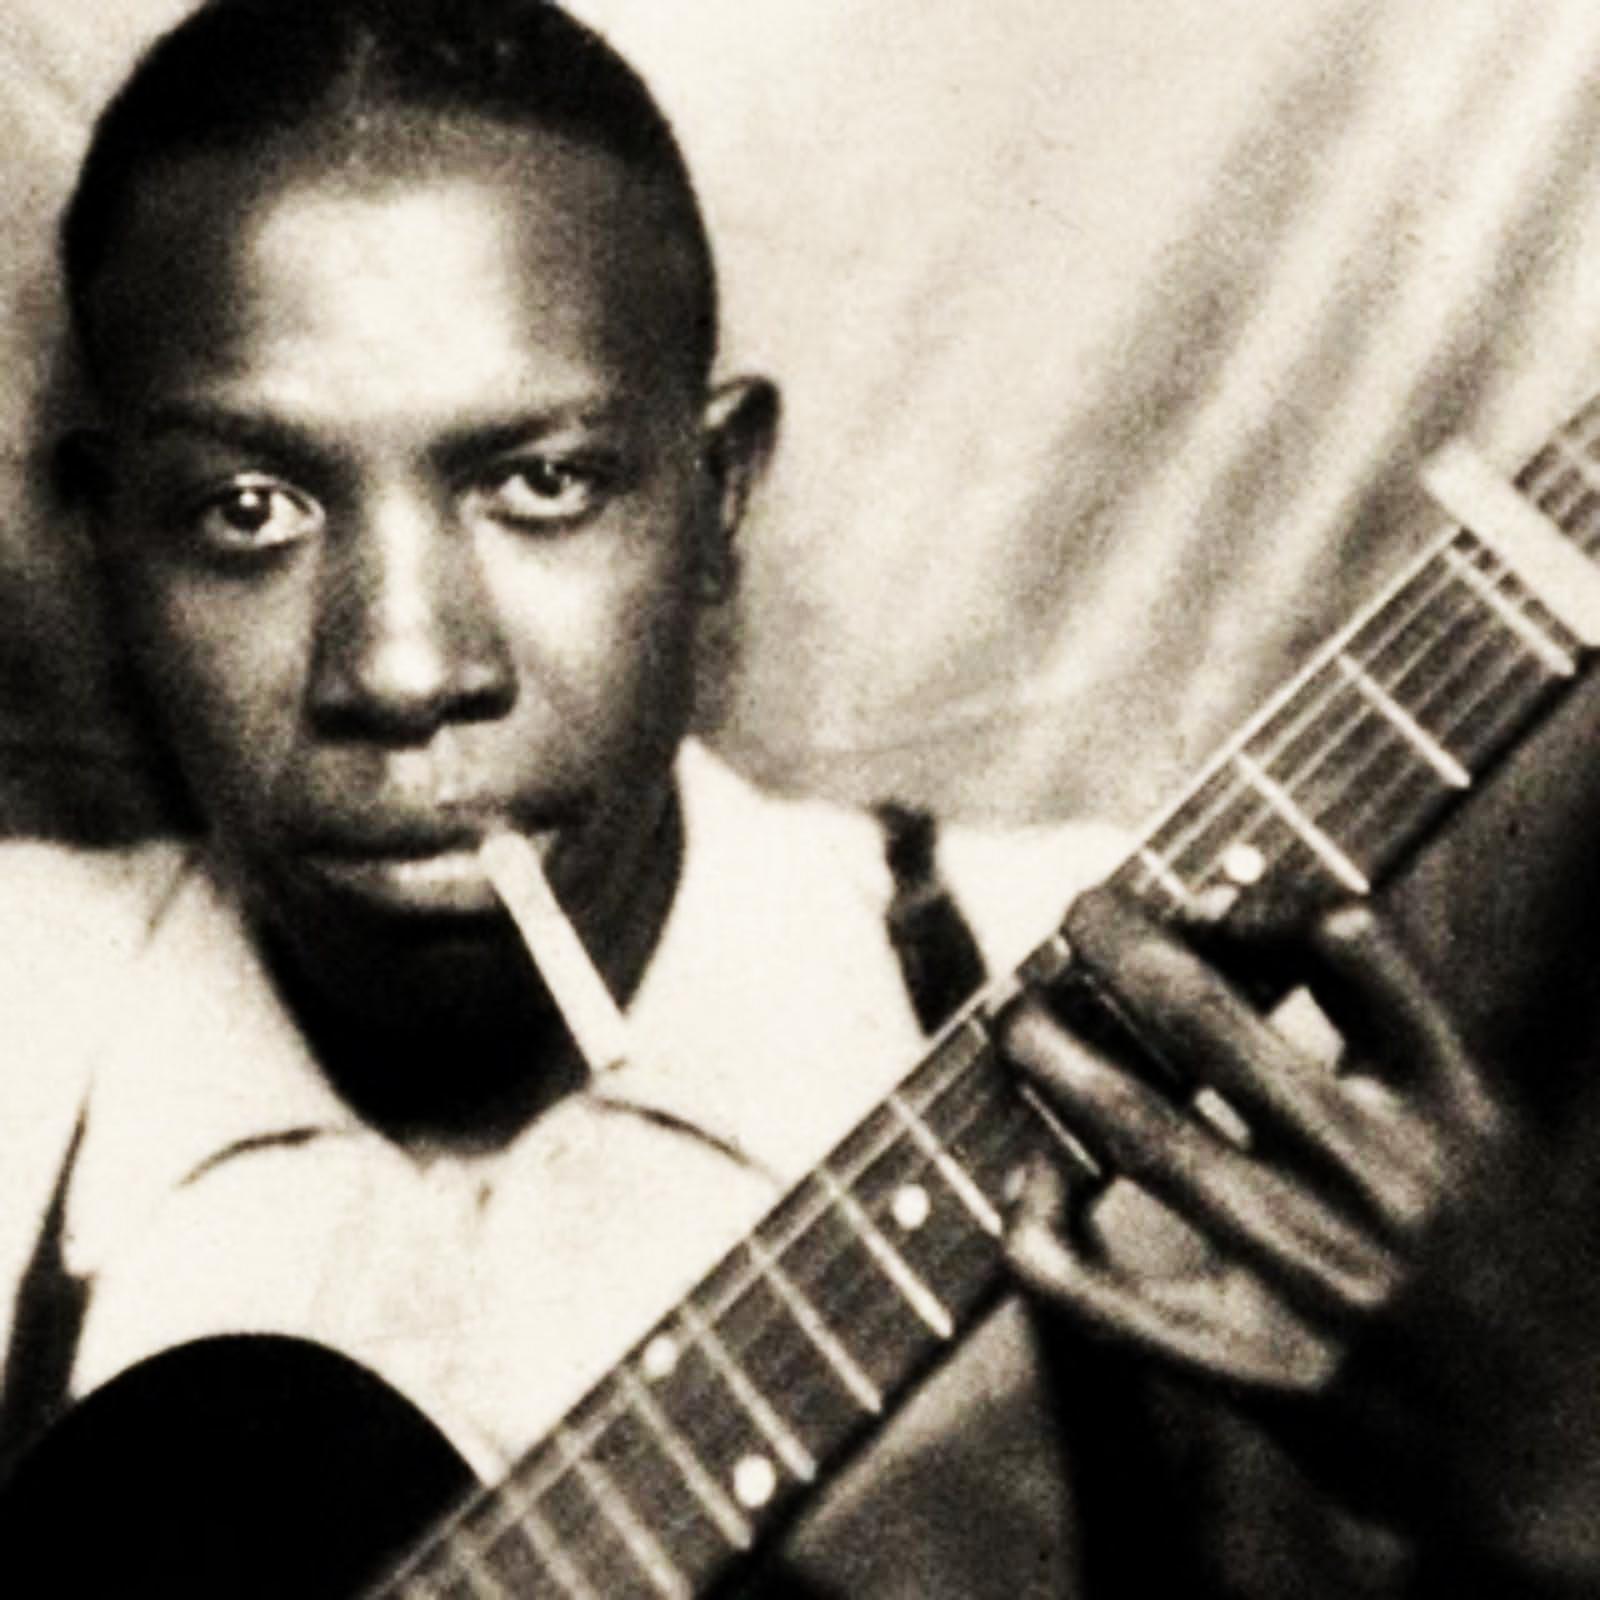 Blues Legend Robert Johnson, Mississippi Delta Blues